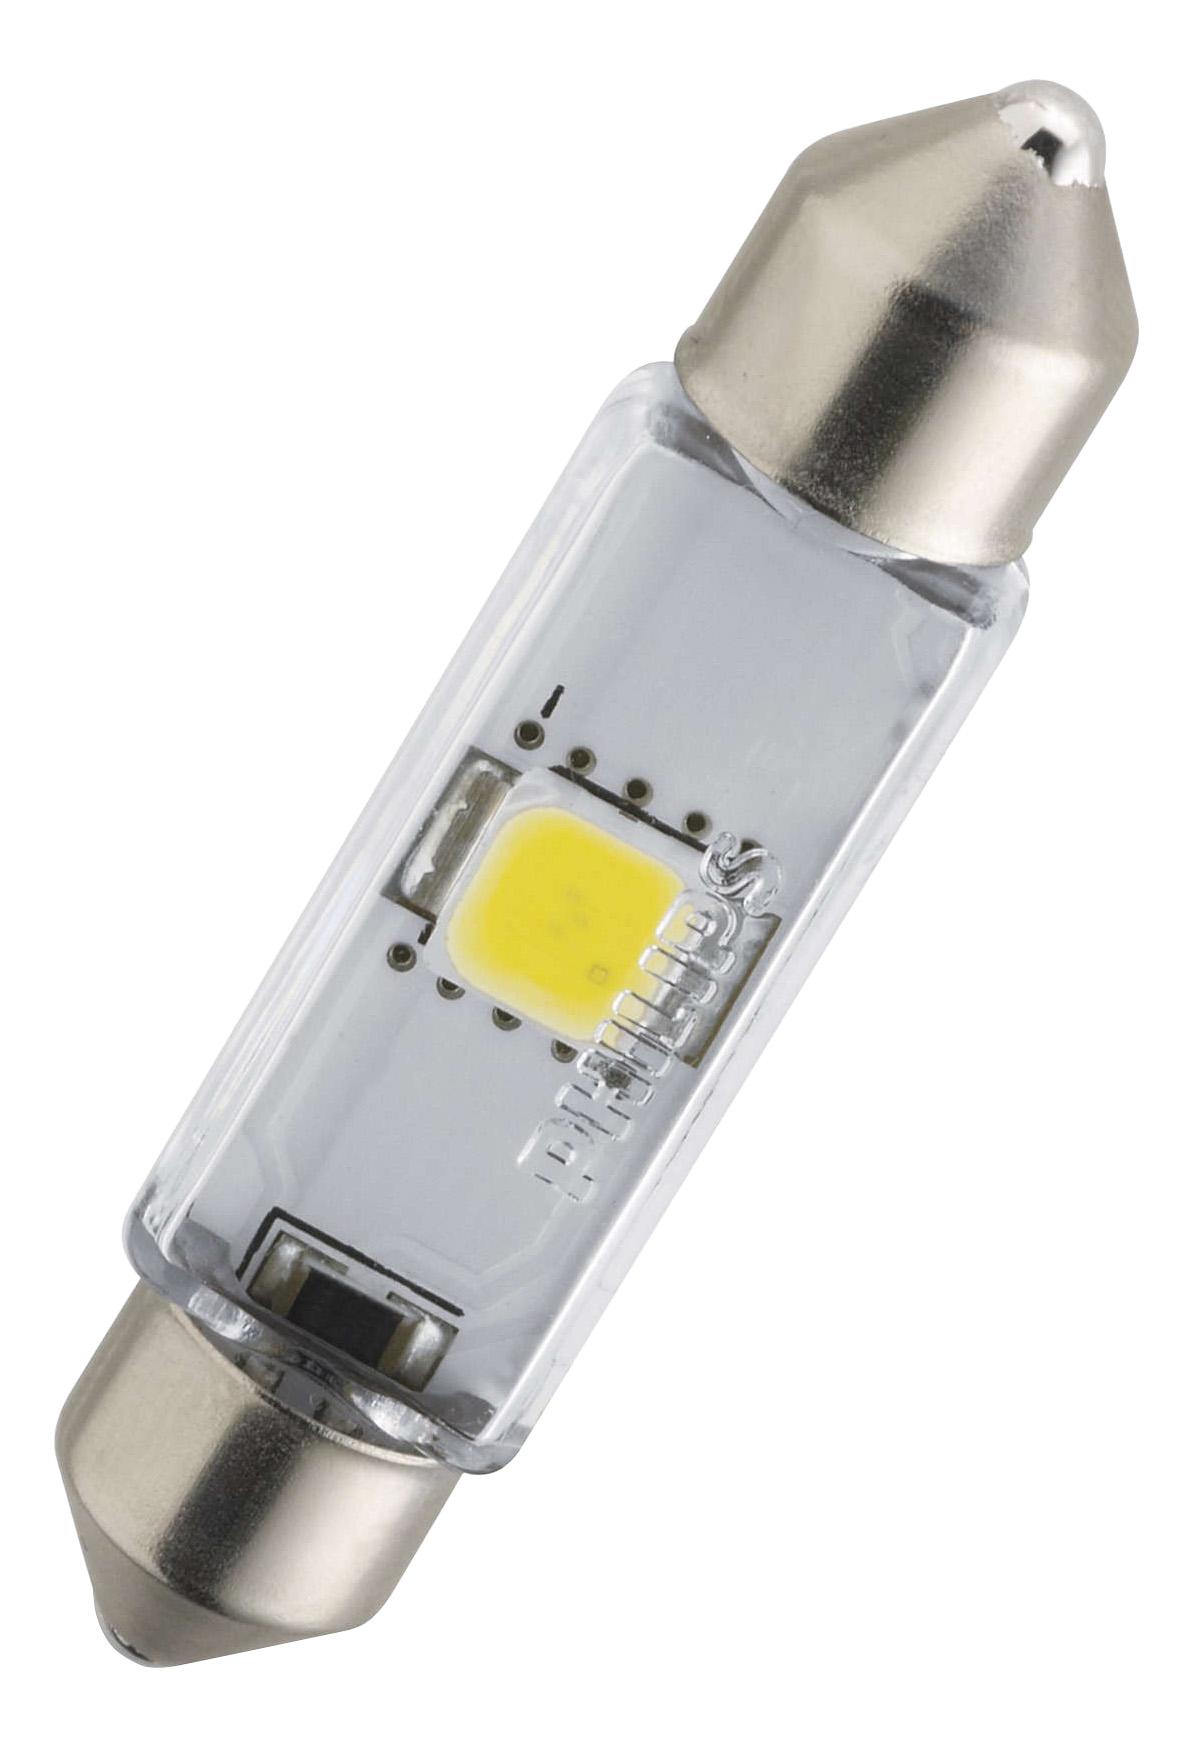 Лампа светодиодная PHILIPS X-tremeUltinon 1W SV8.5-41/11 129454000KX1 фото